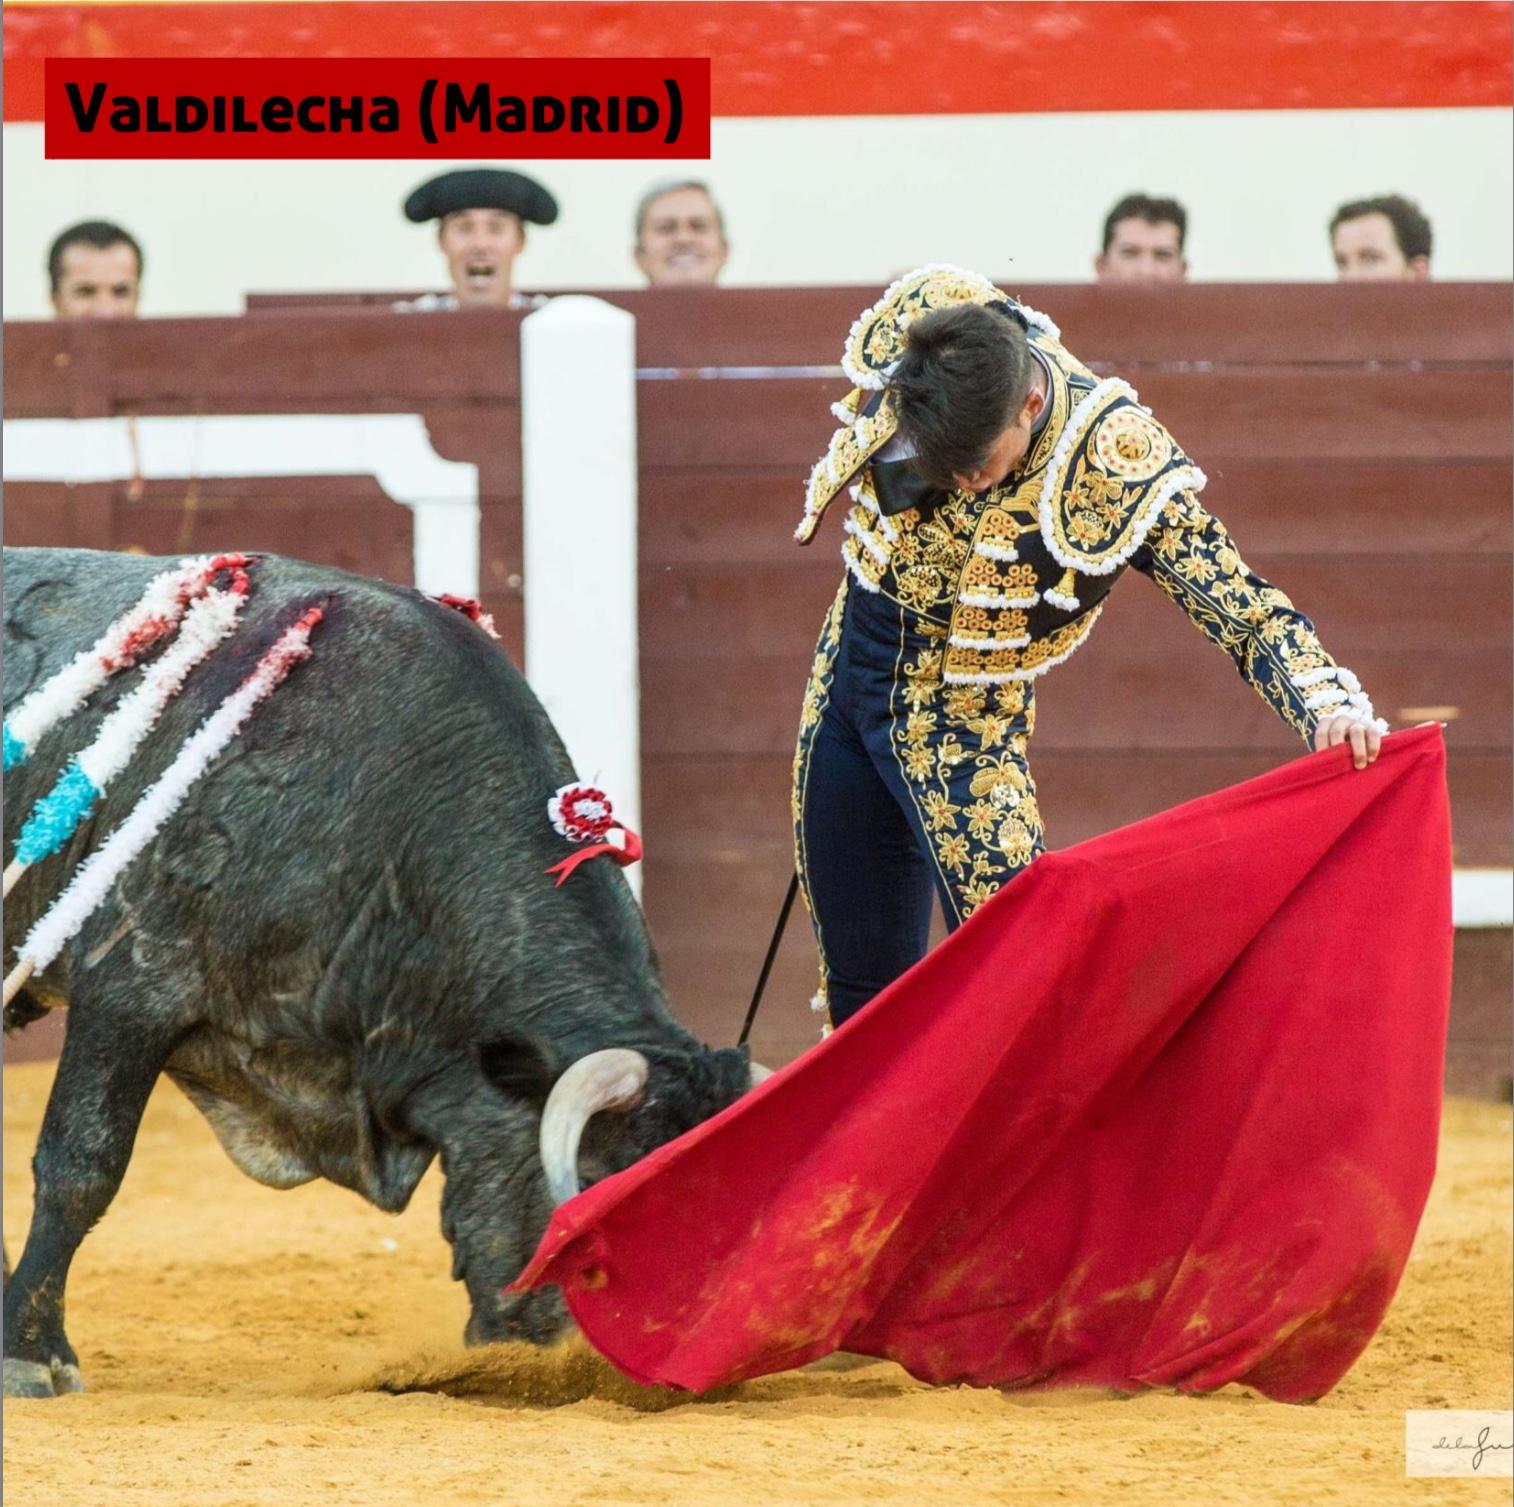 Valdilecha 12/09/2017